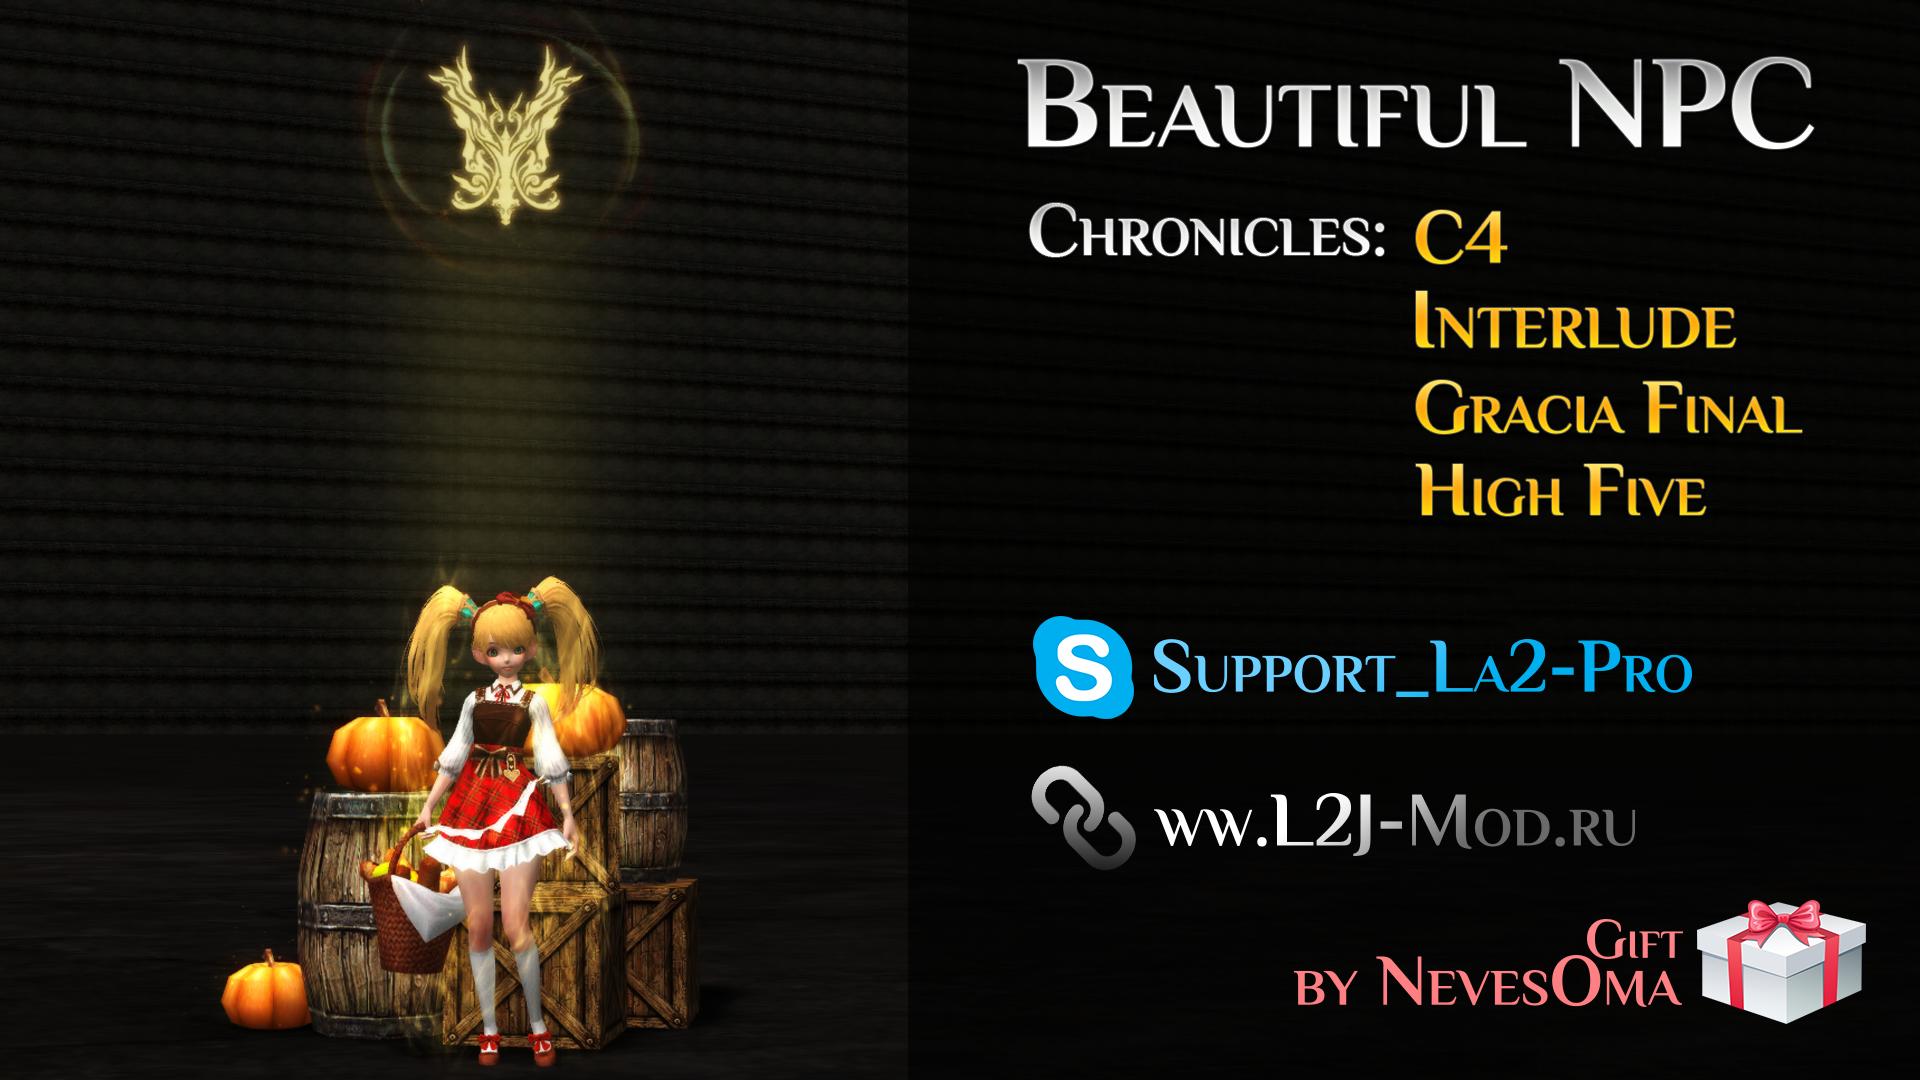 Npc+Effect+Logo Beautiful Dwarf для C4, Interlude, Gracia Final, High Five